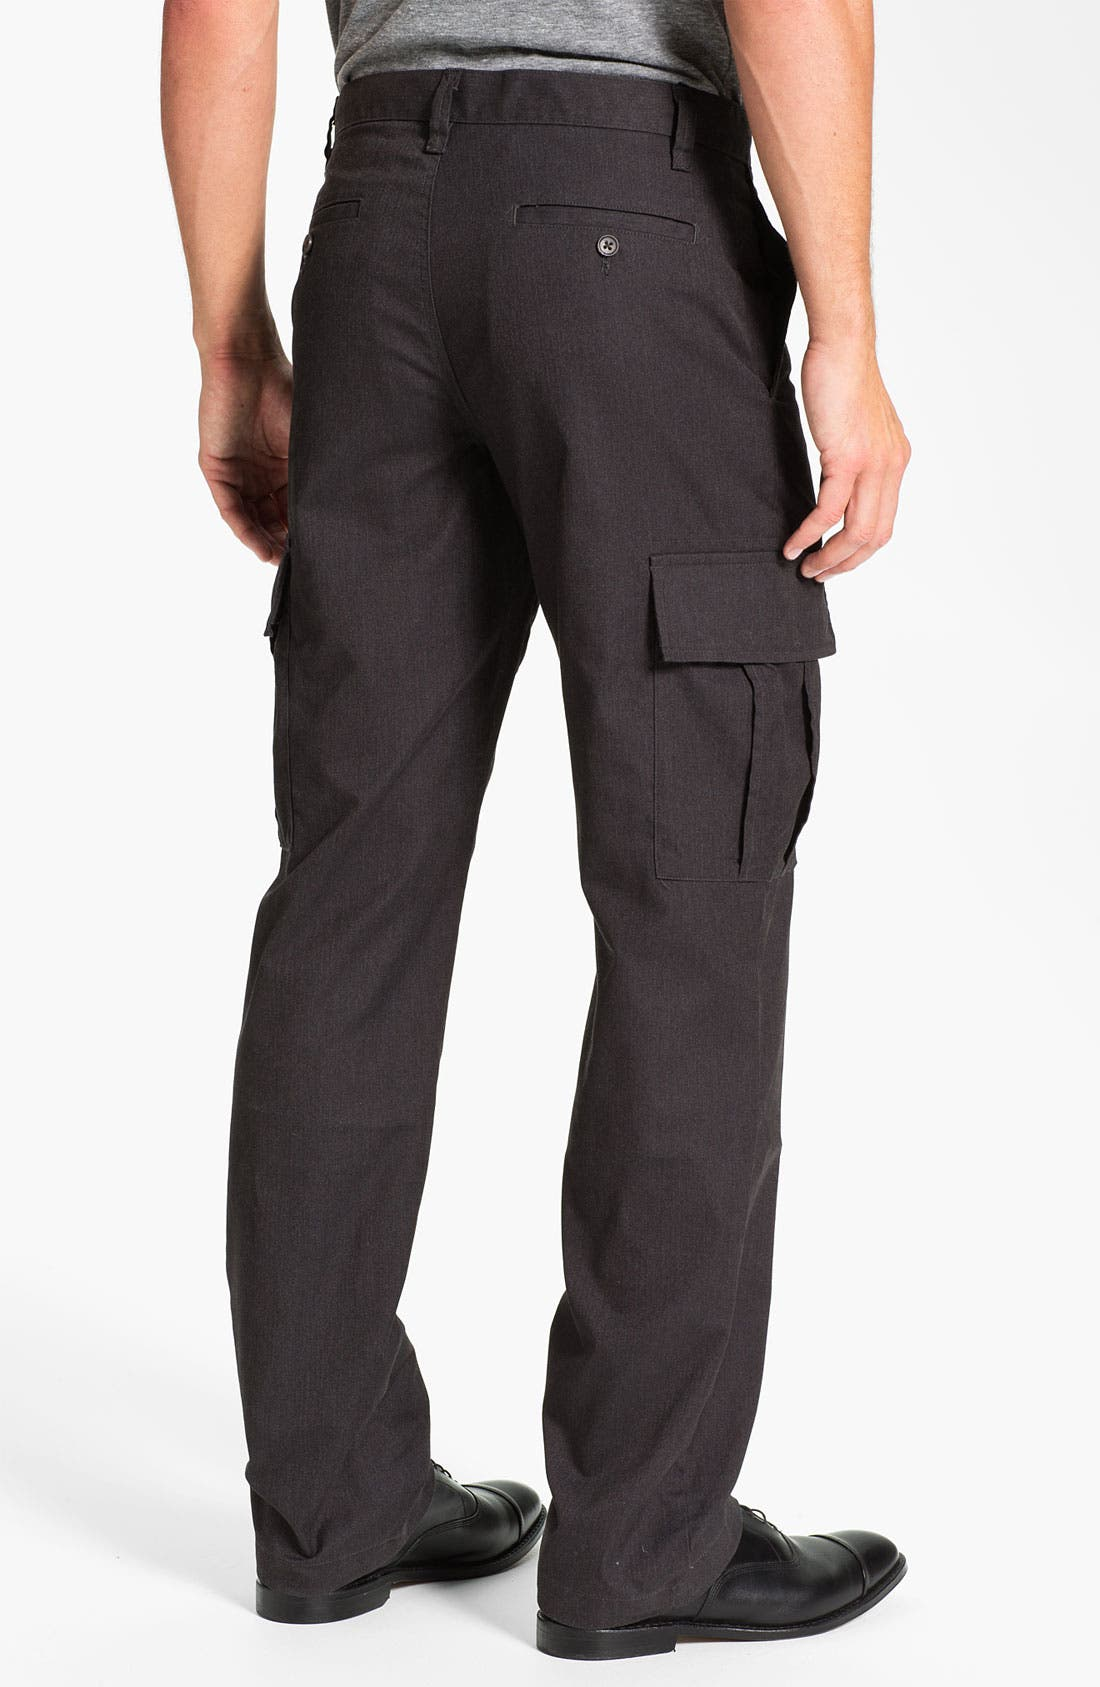 Alternate Image 2  - Wallin & Bros. 'Milner' Cargo Pants